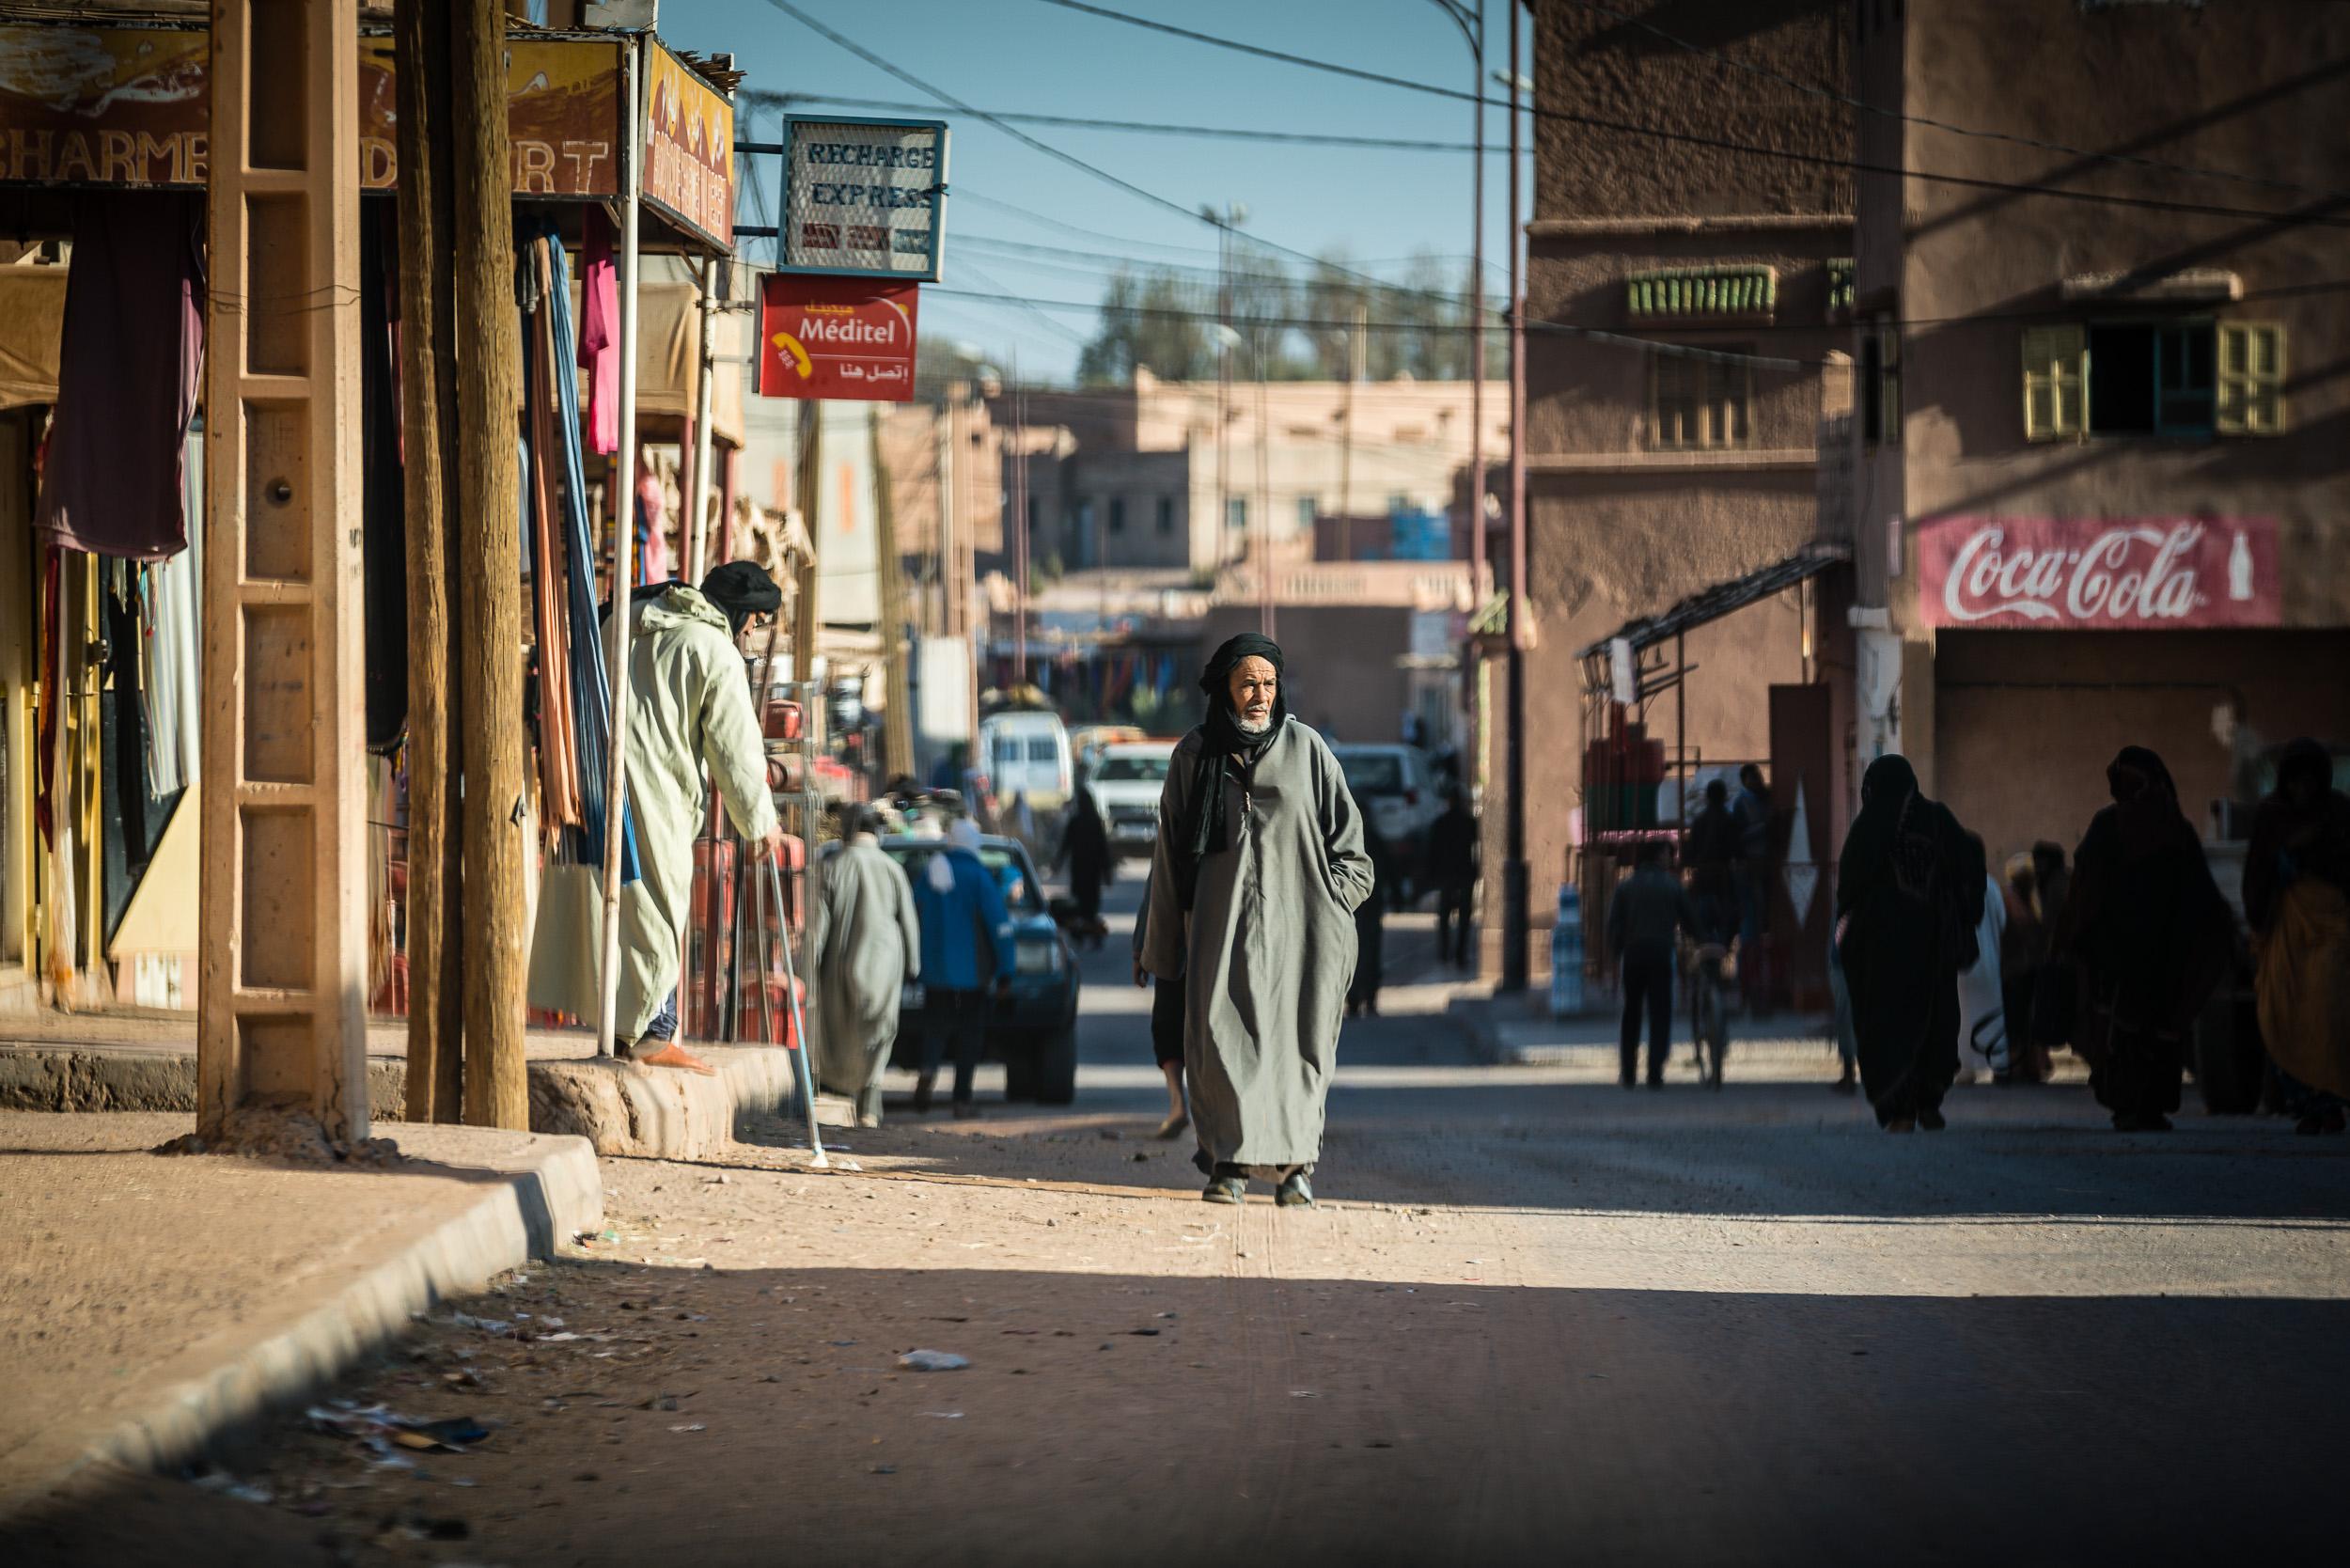 Morocco-1.jpg